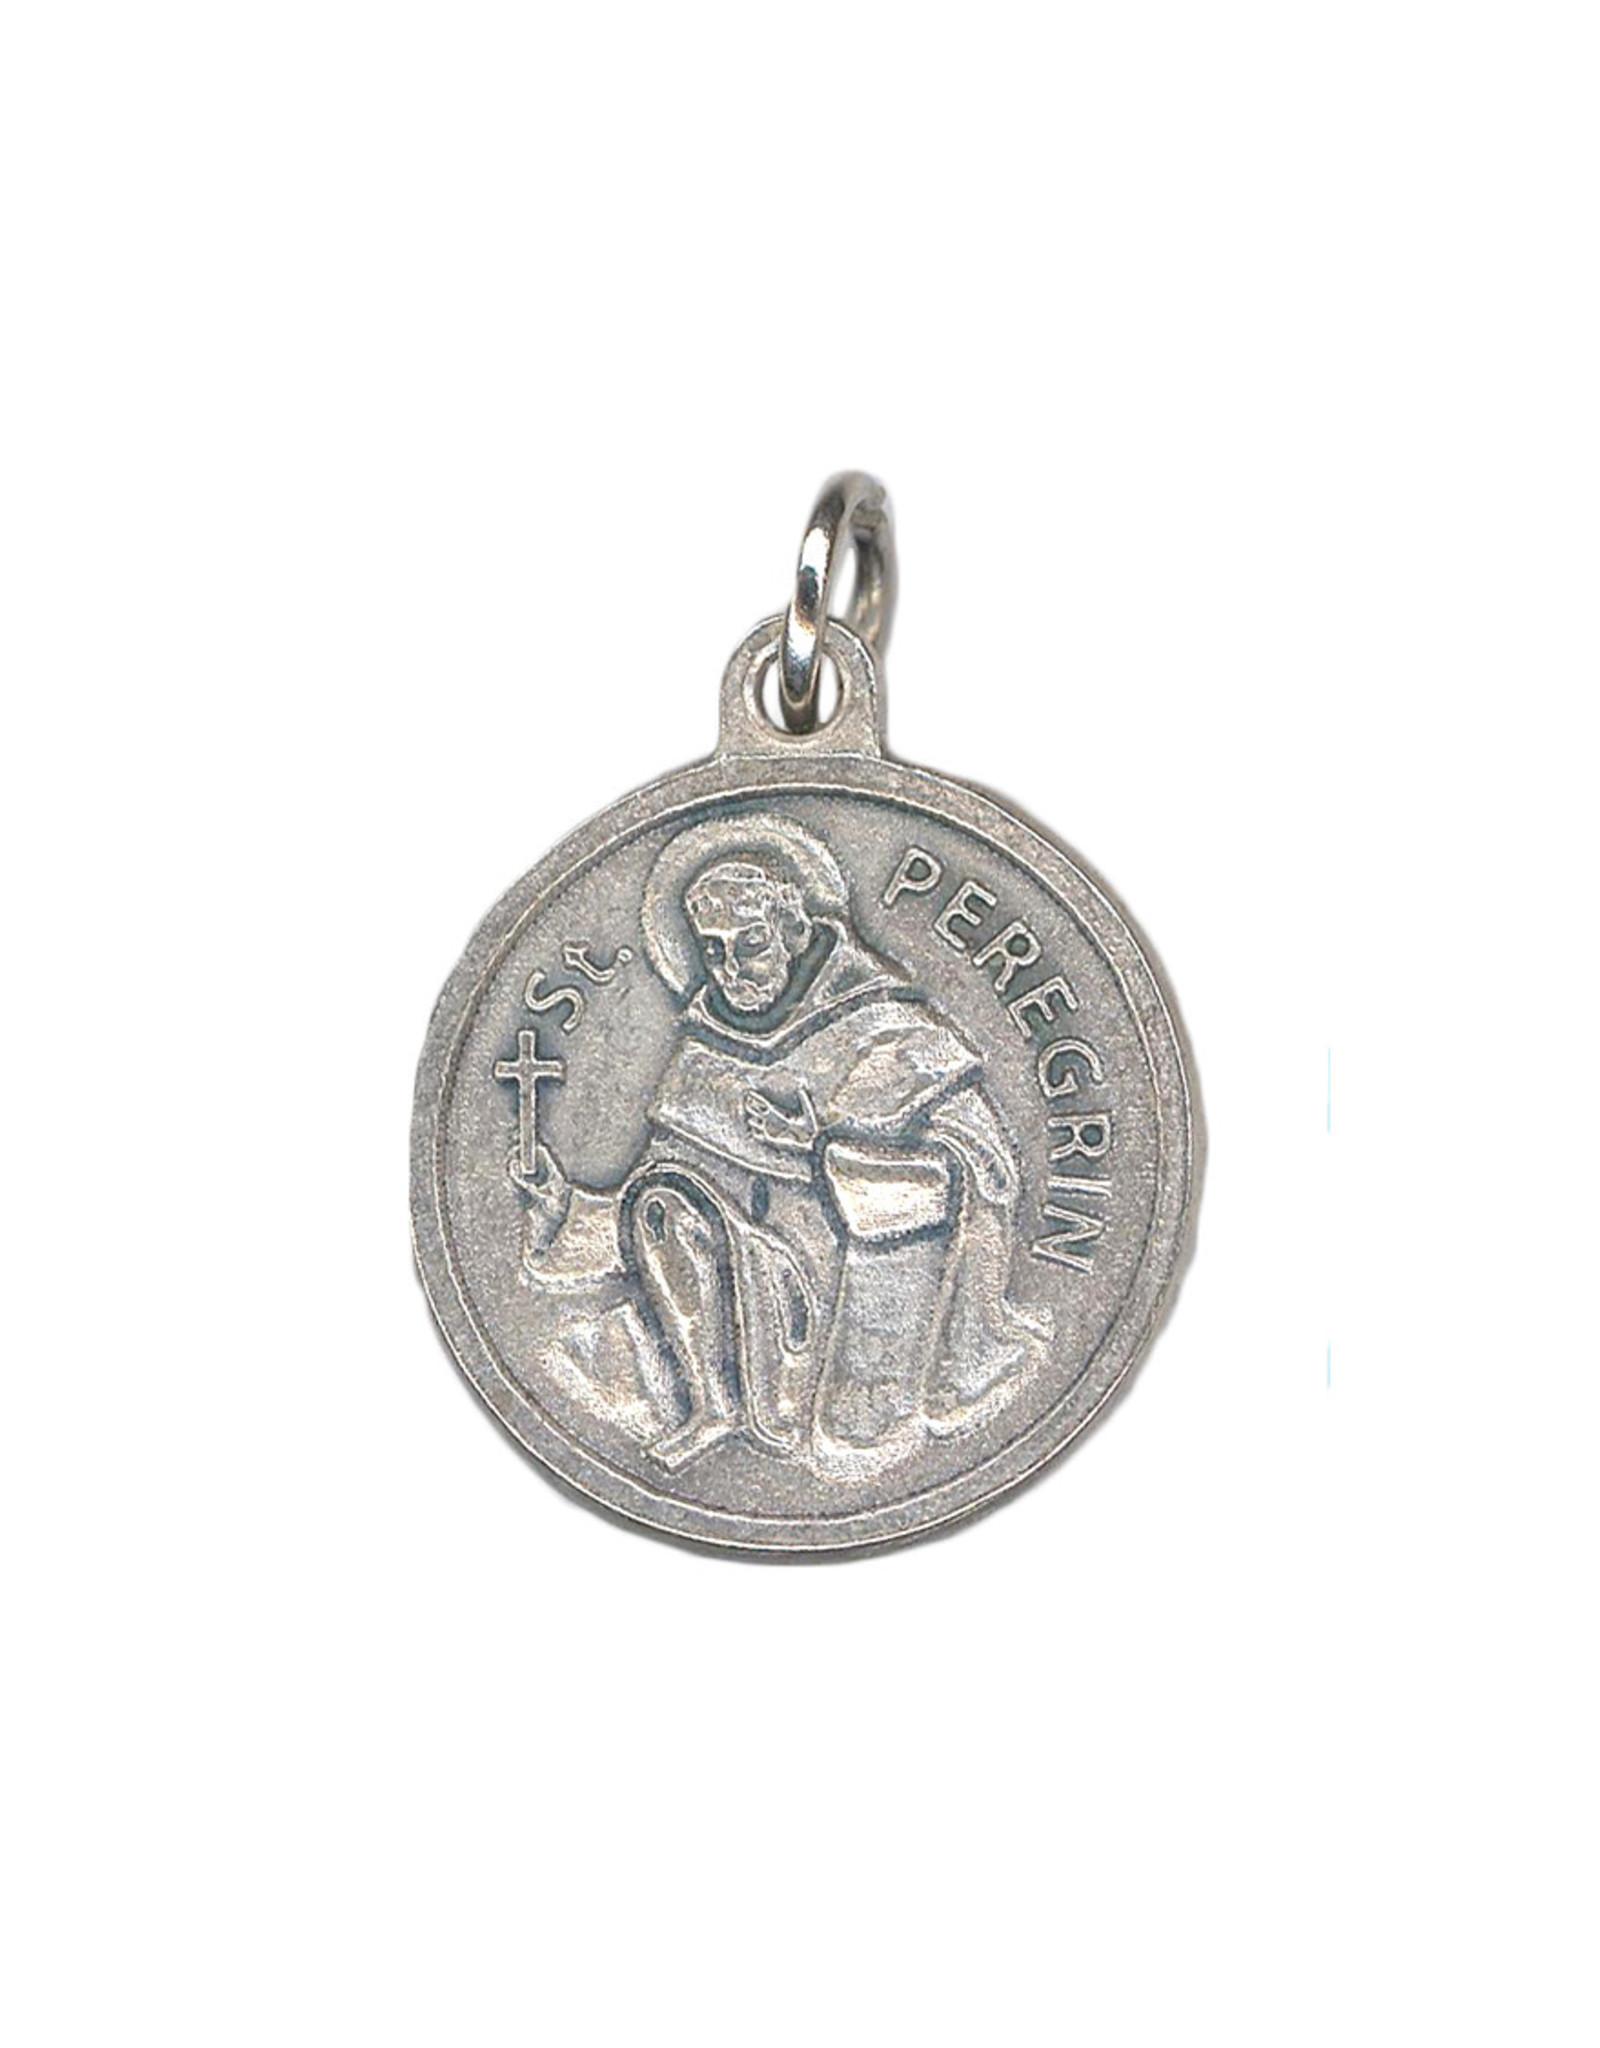 Relic medal Saint Peregrine